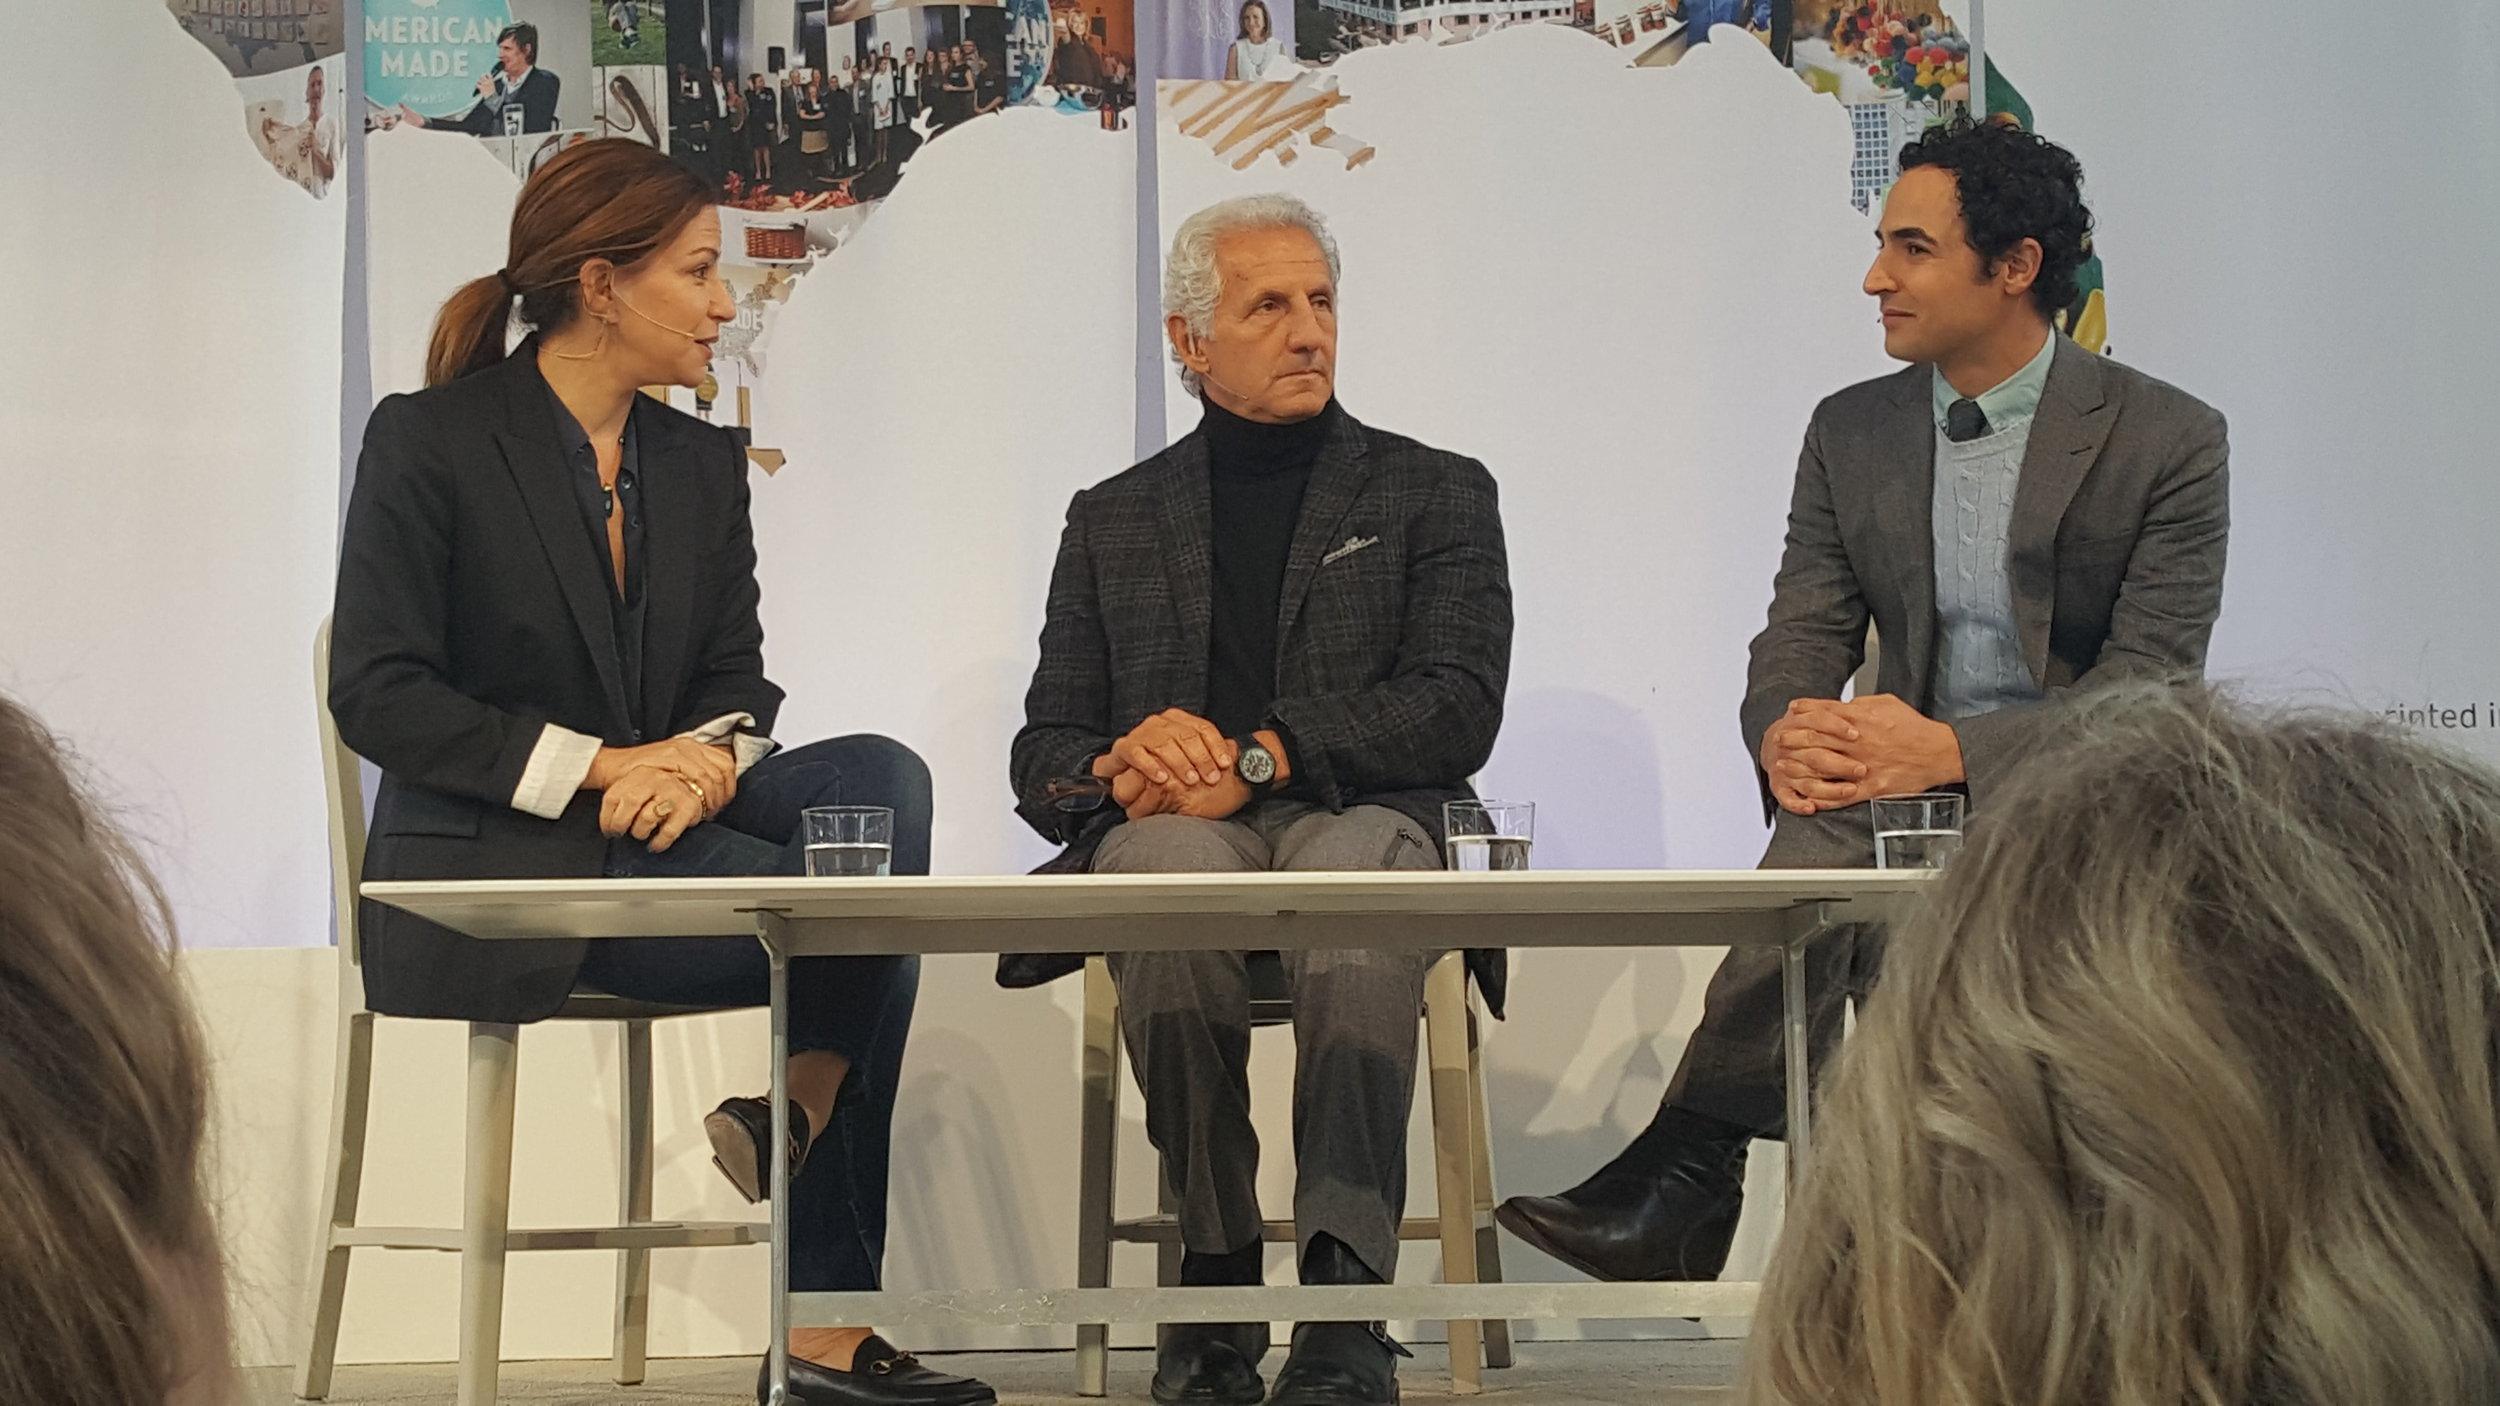 Deborah Needleman of T Magazine, designers Joseph Abboud and Zac Posen